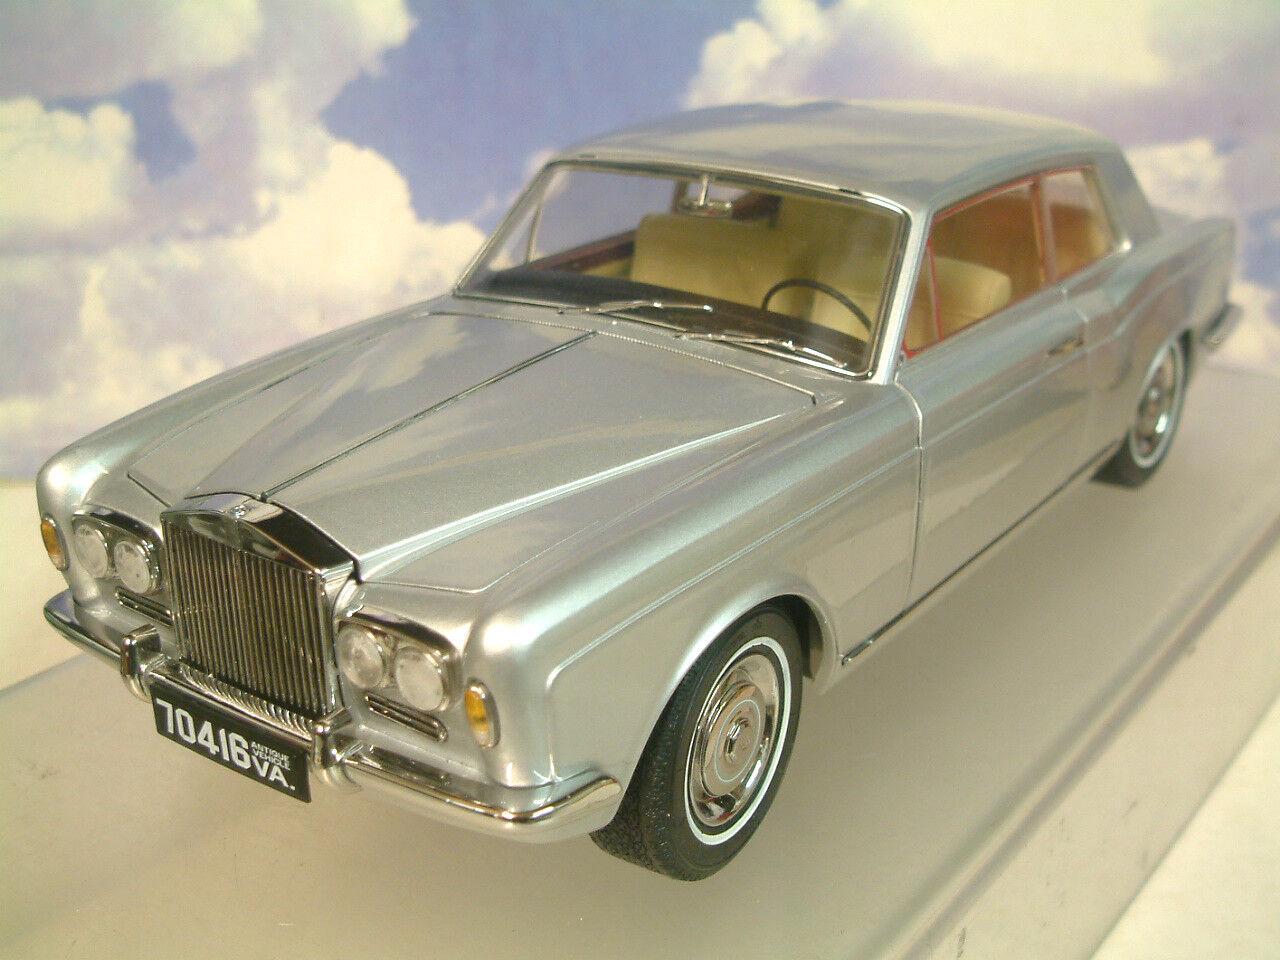 1 18 Paragon 1968 Rolls Royce plata Shadow mpw Lhd 2 Puertas Coupe Plata Cáliz